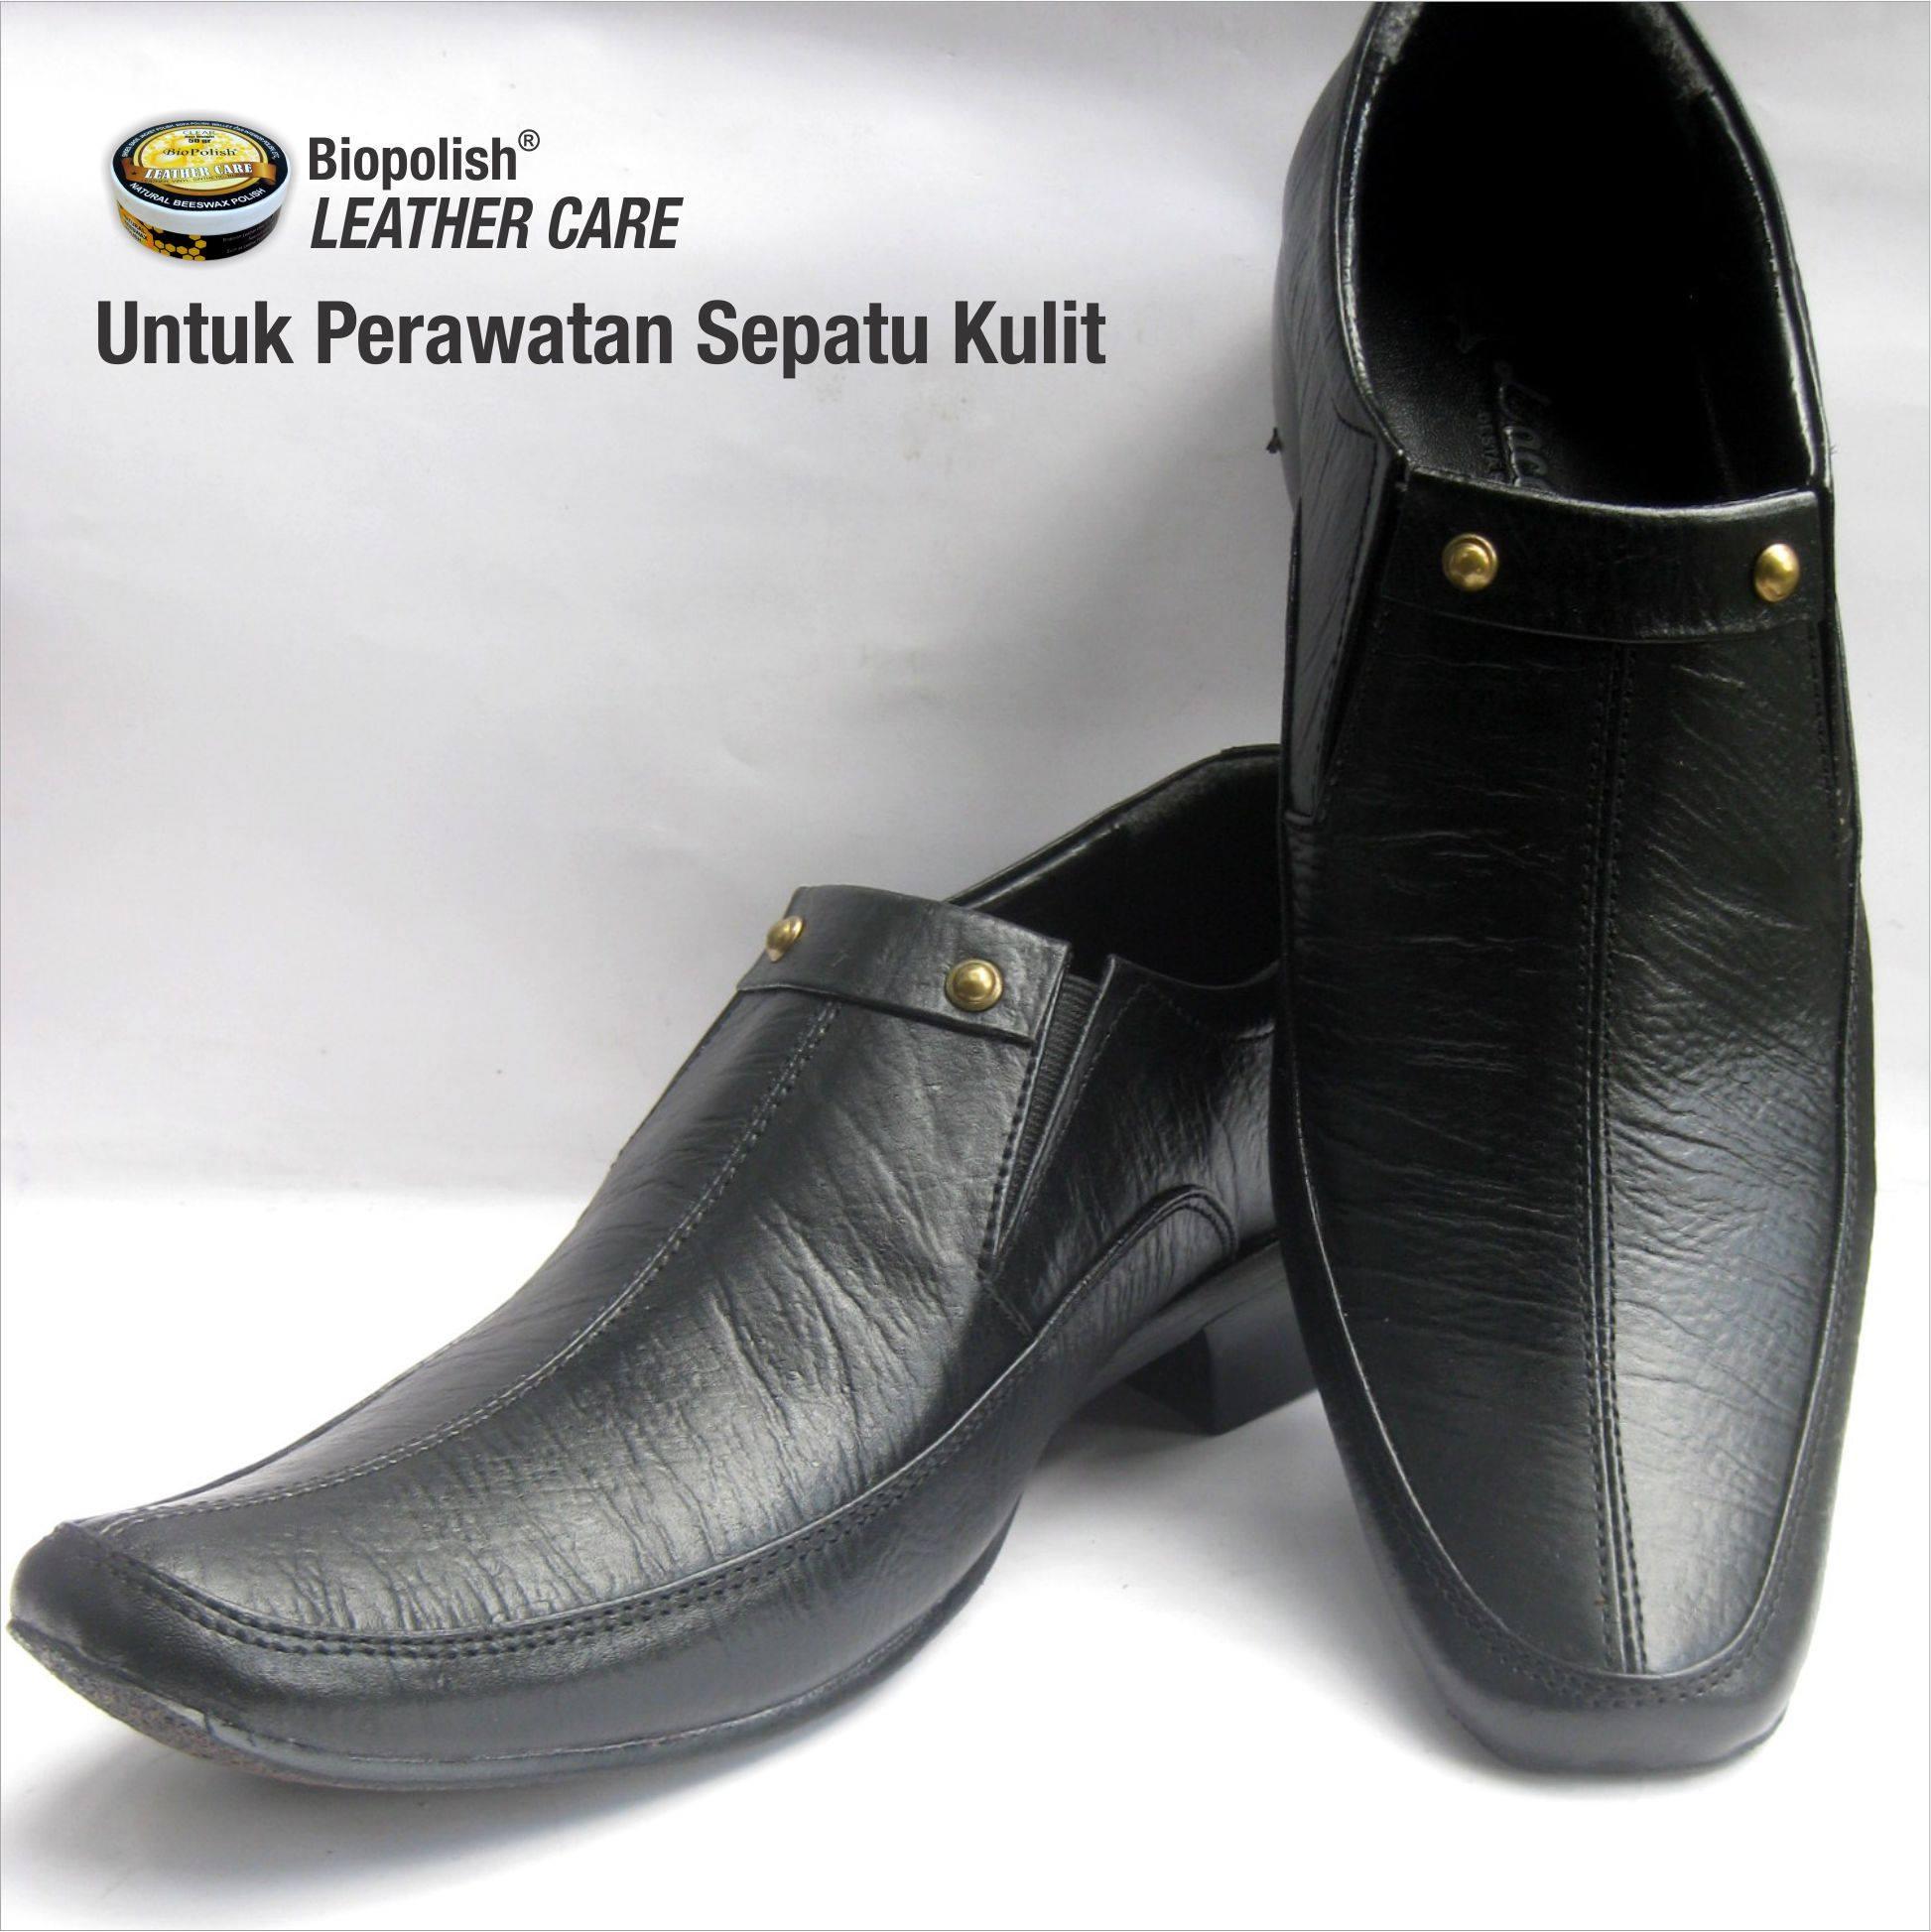 Jual Semir Sepatu Kulit Hitam Biopolish Poles Alami Tokopedia Shoe Polish Leather